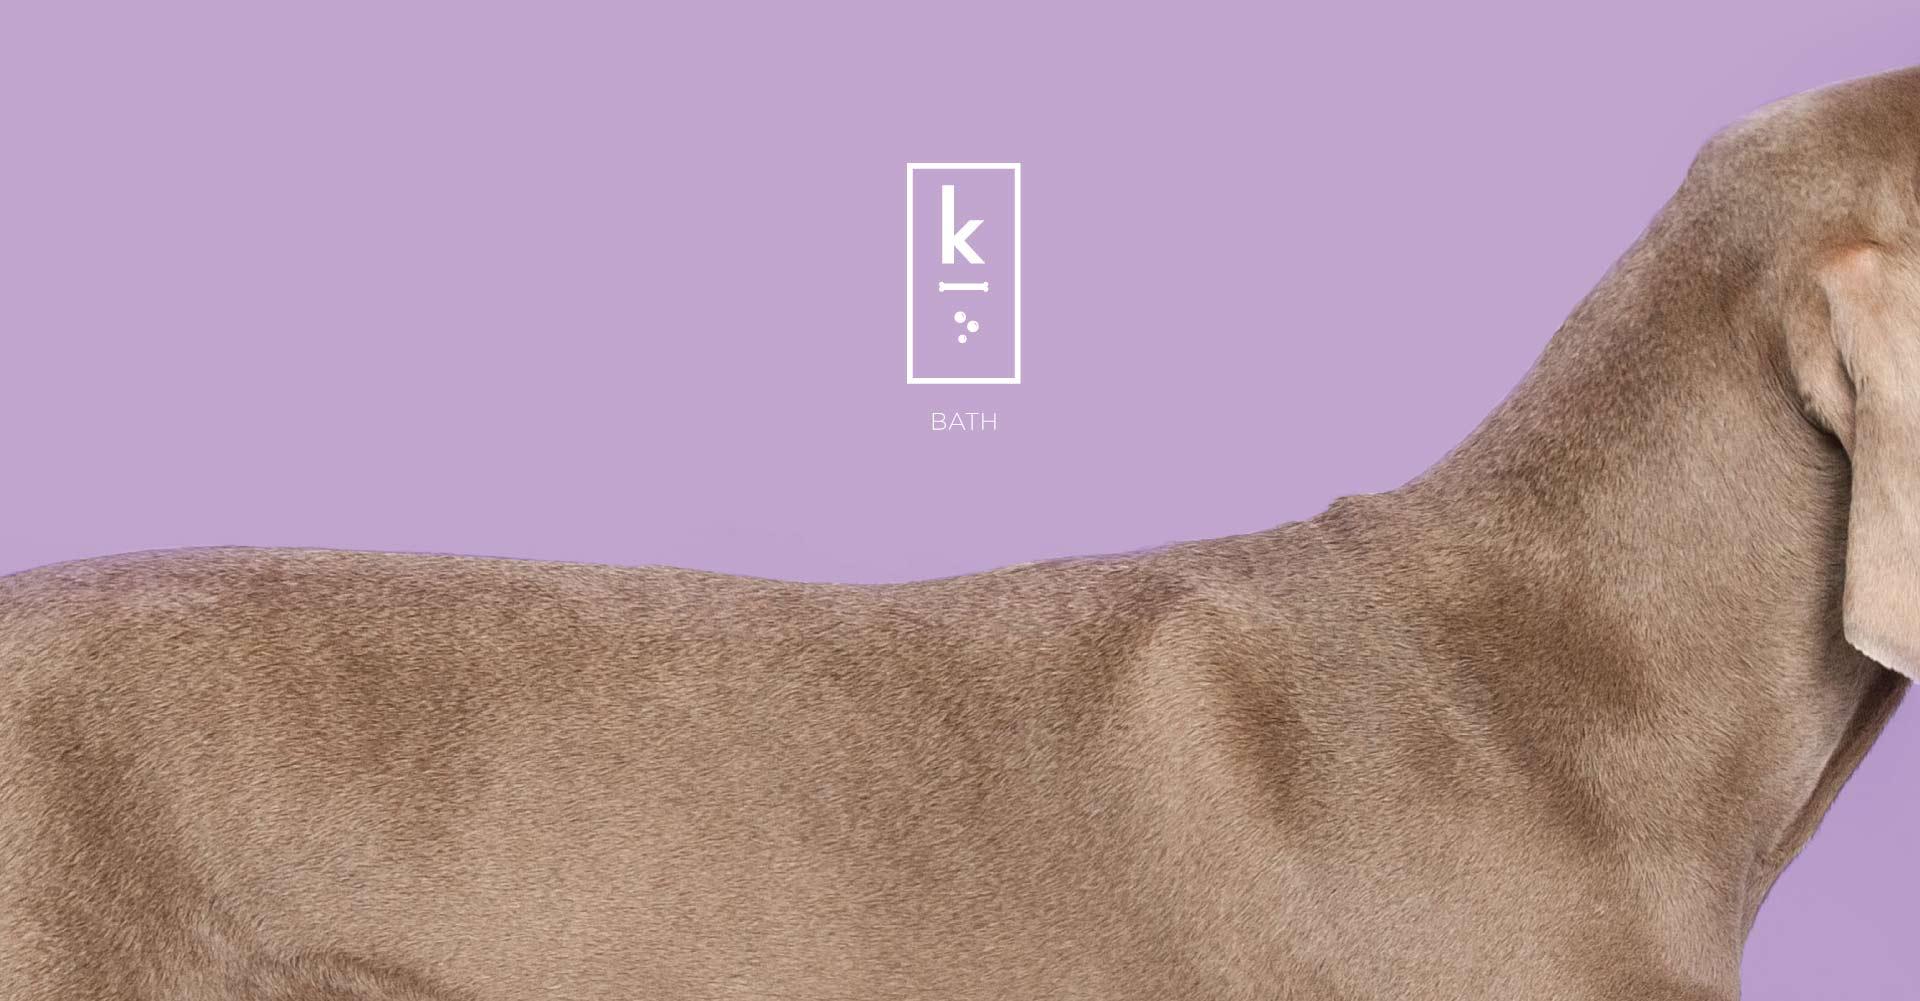 Creative_Retail_Packaging_Branding_Identity_Design_Klementime_12.jpg